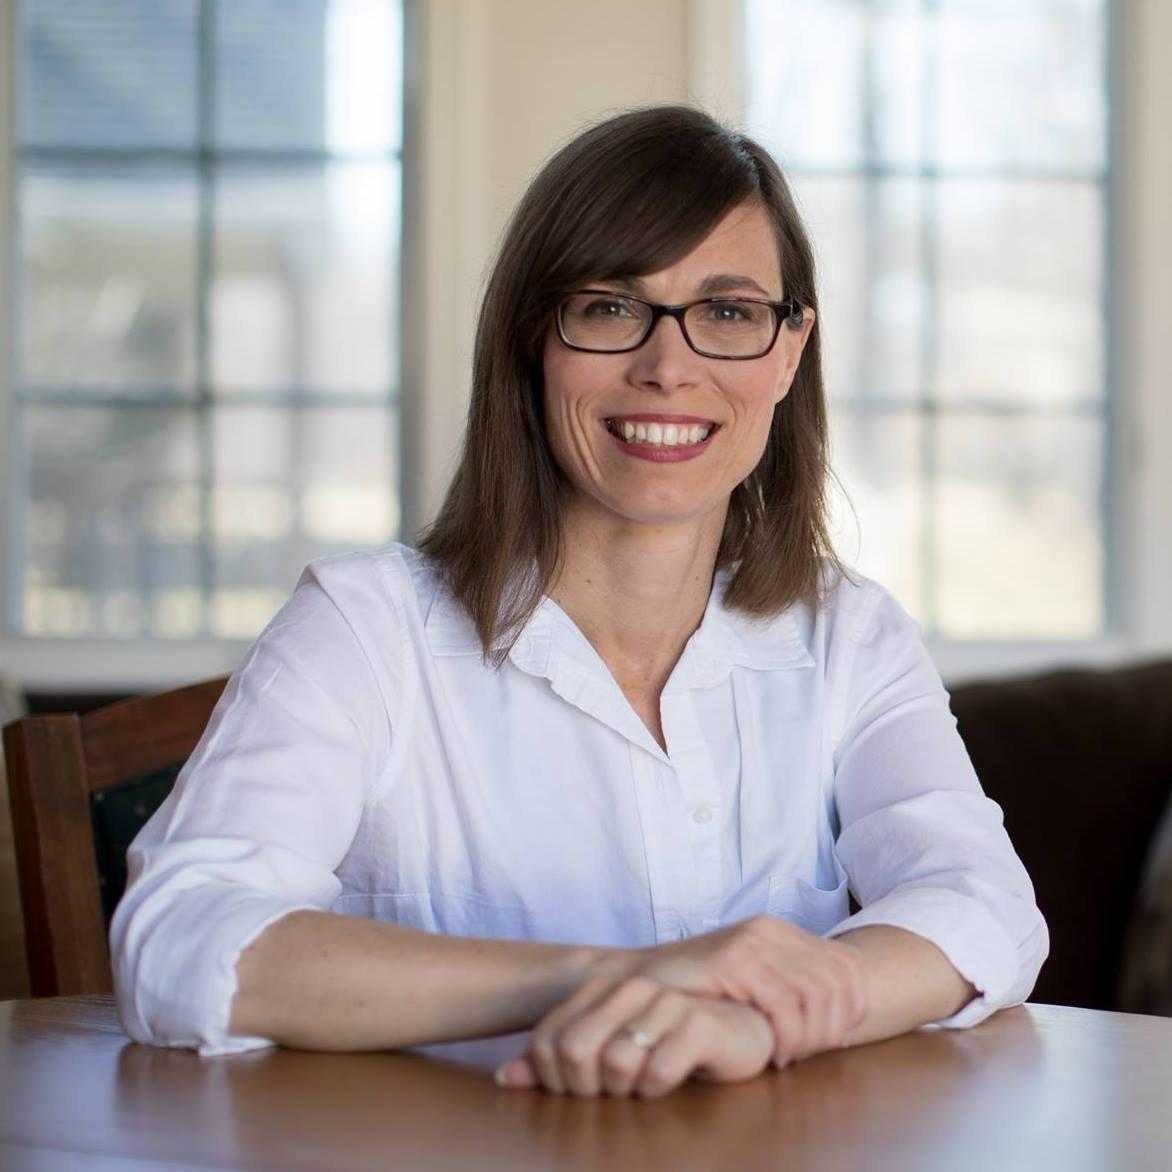 Liz Watson a progressive labor attorney won the Democratic primary for Indianas 9th Congressional District